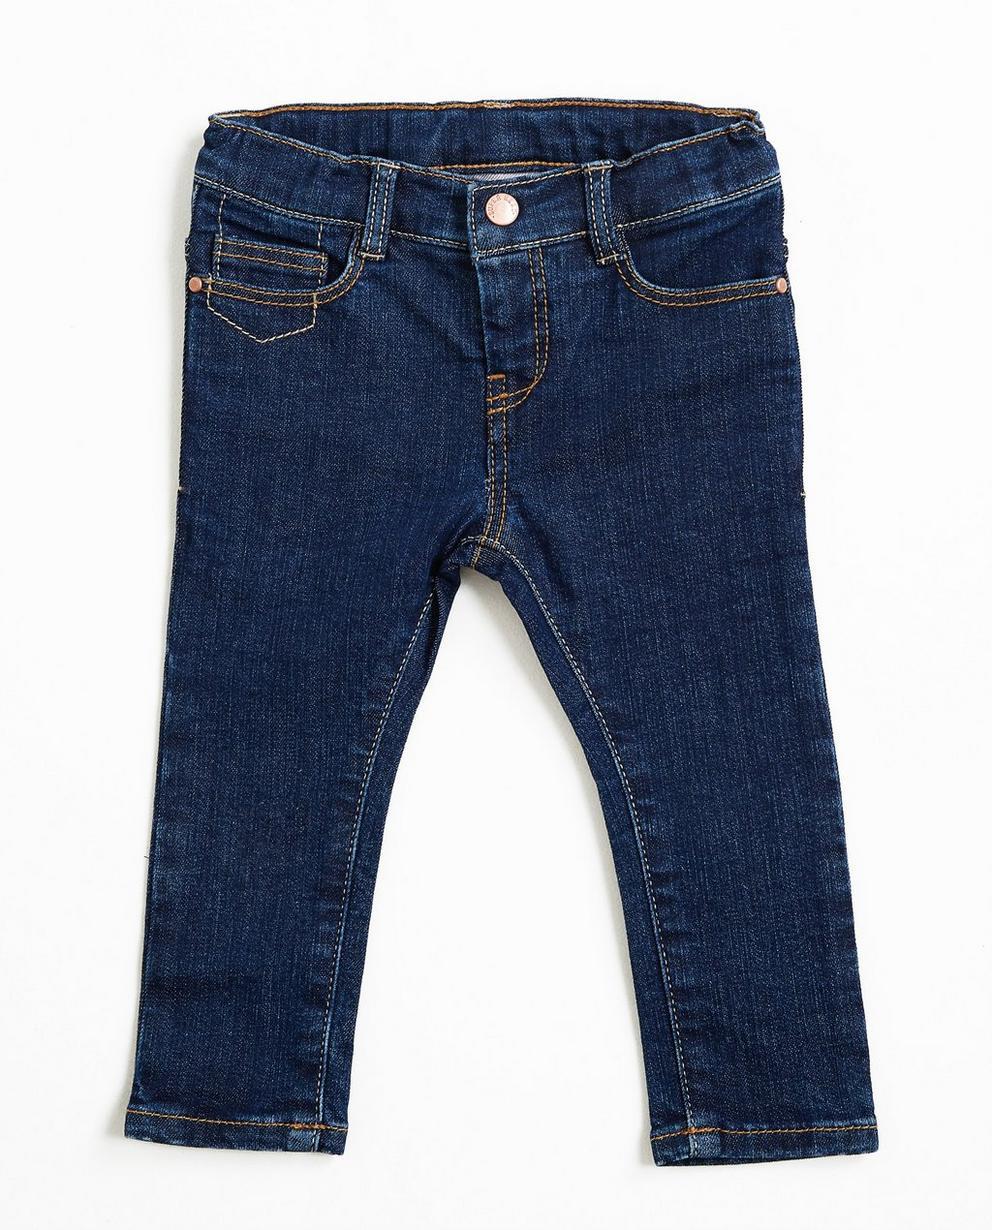 Donkerblauwe slim jeans - dry denim - JBC